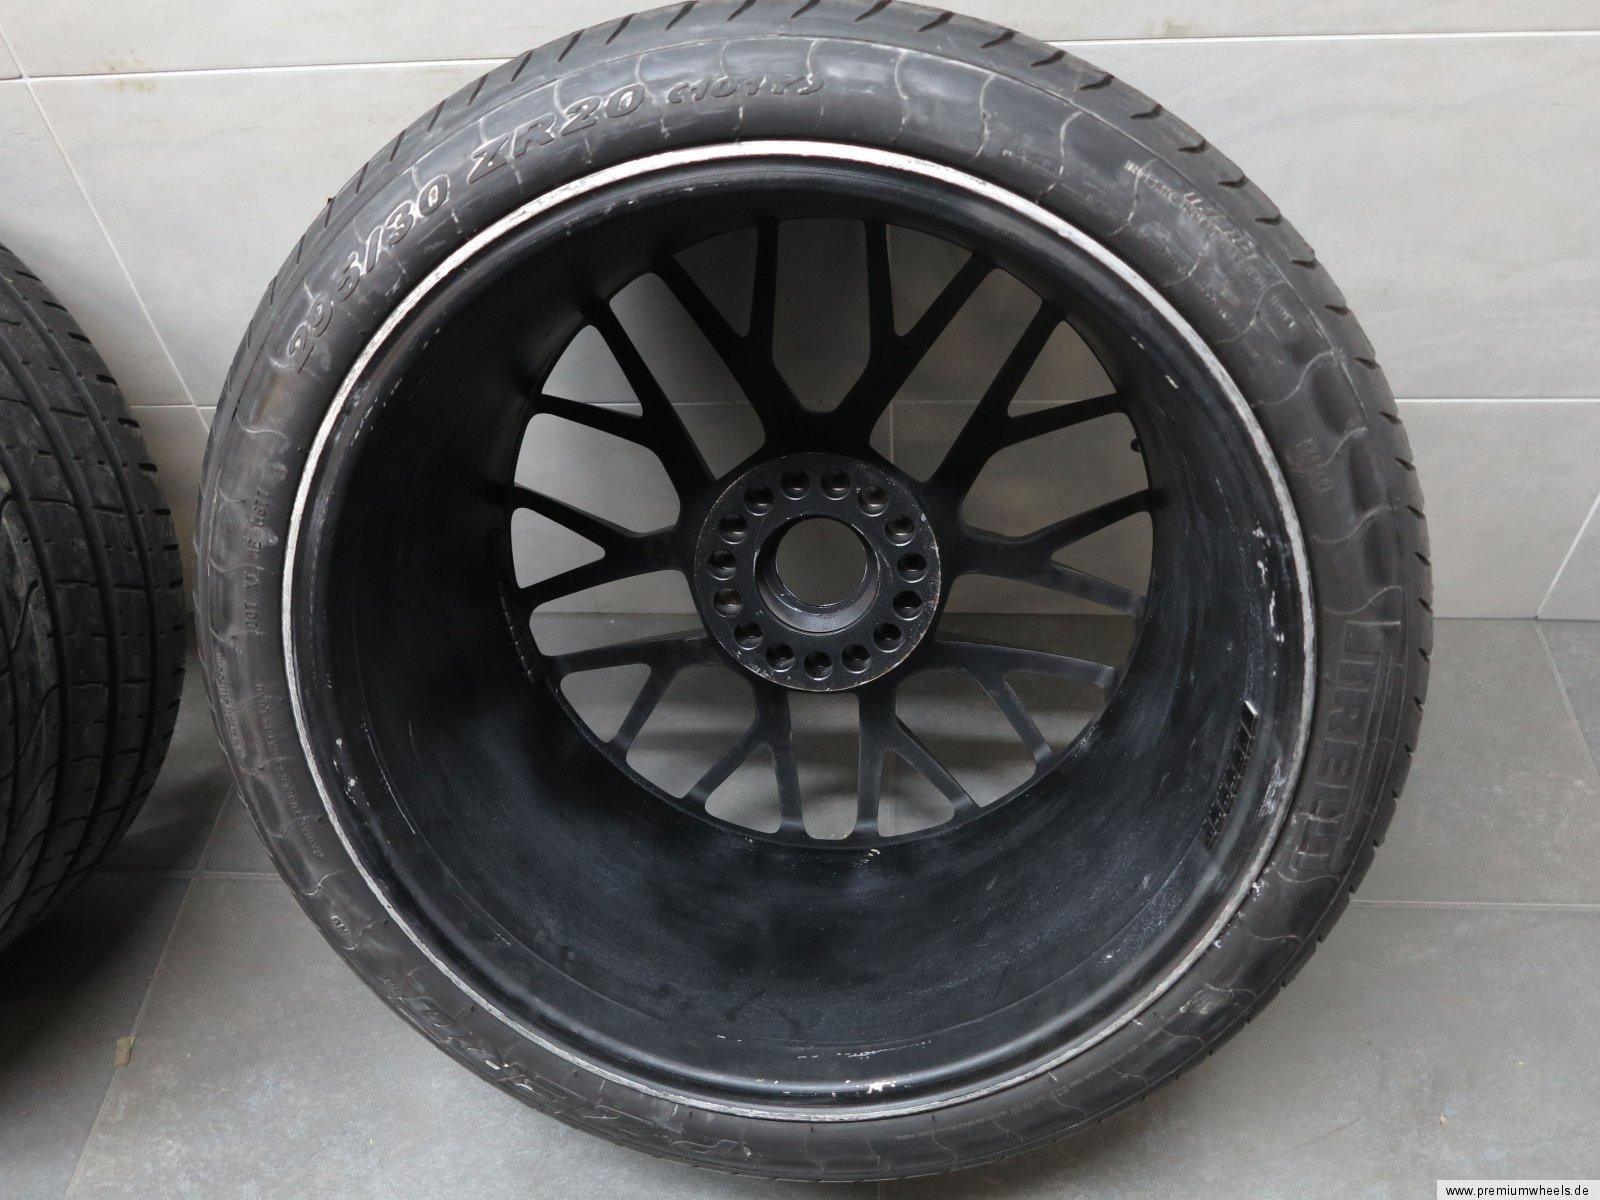 20 inch original summer wheels porsche 911 991 turbo s 4s gts gt3 ebay. Black Bedroom Furniture Sets. Home Design Ideas